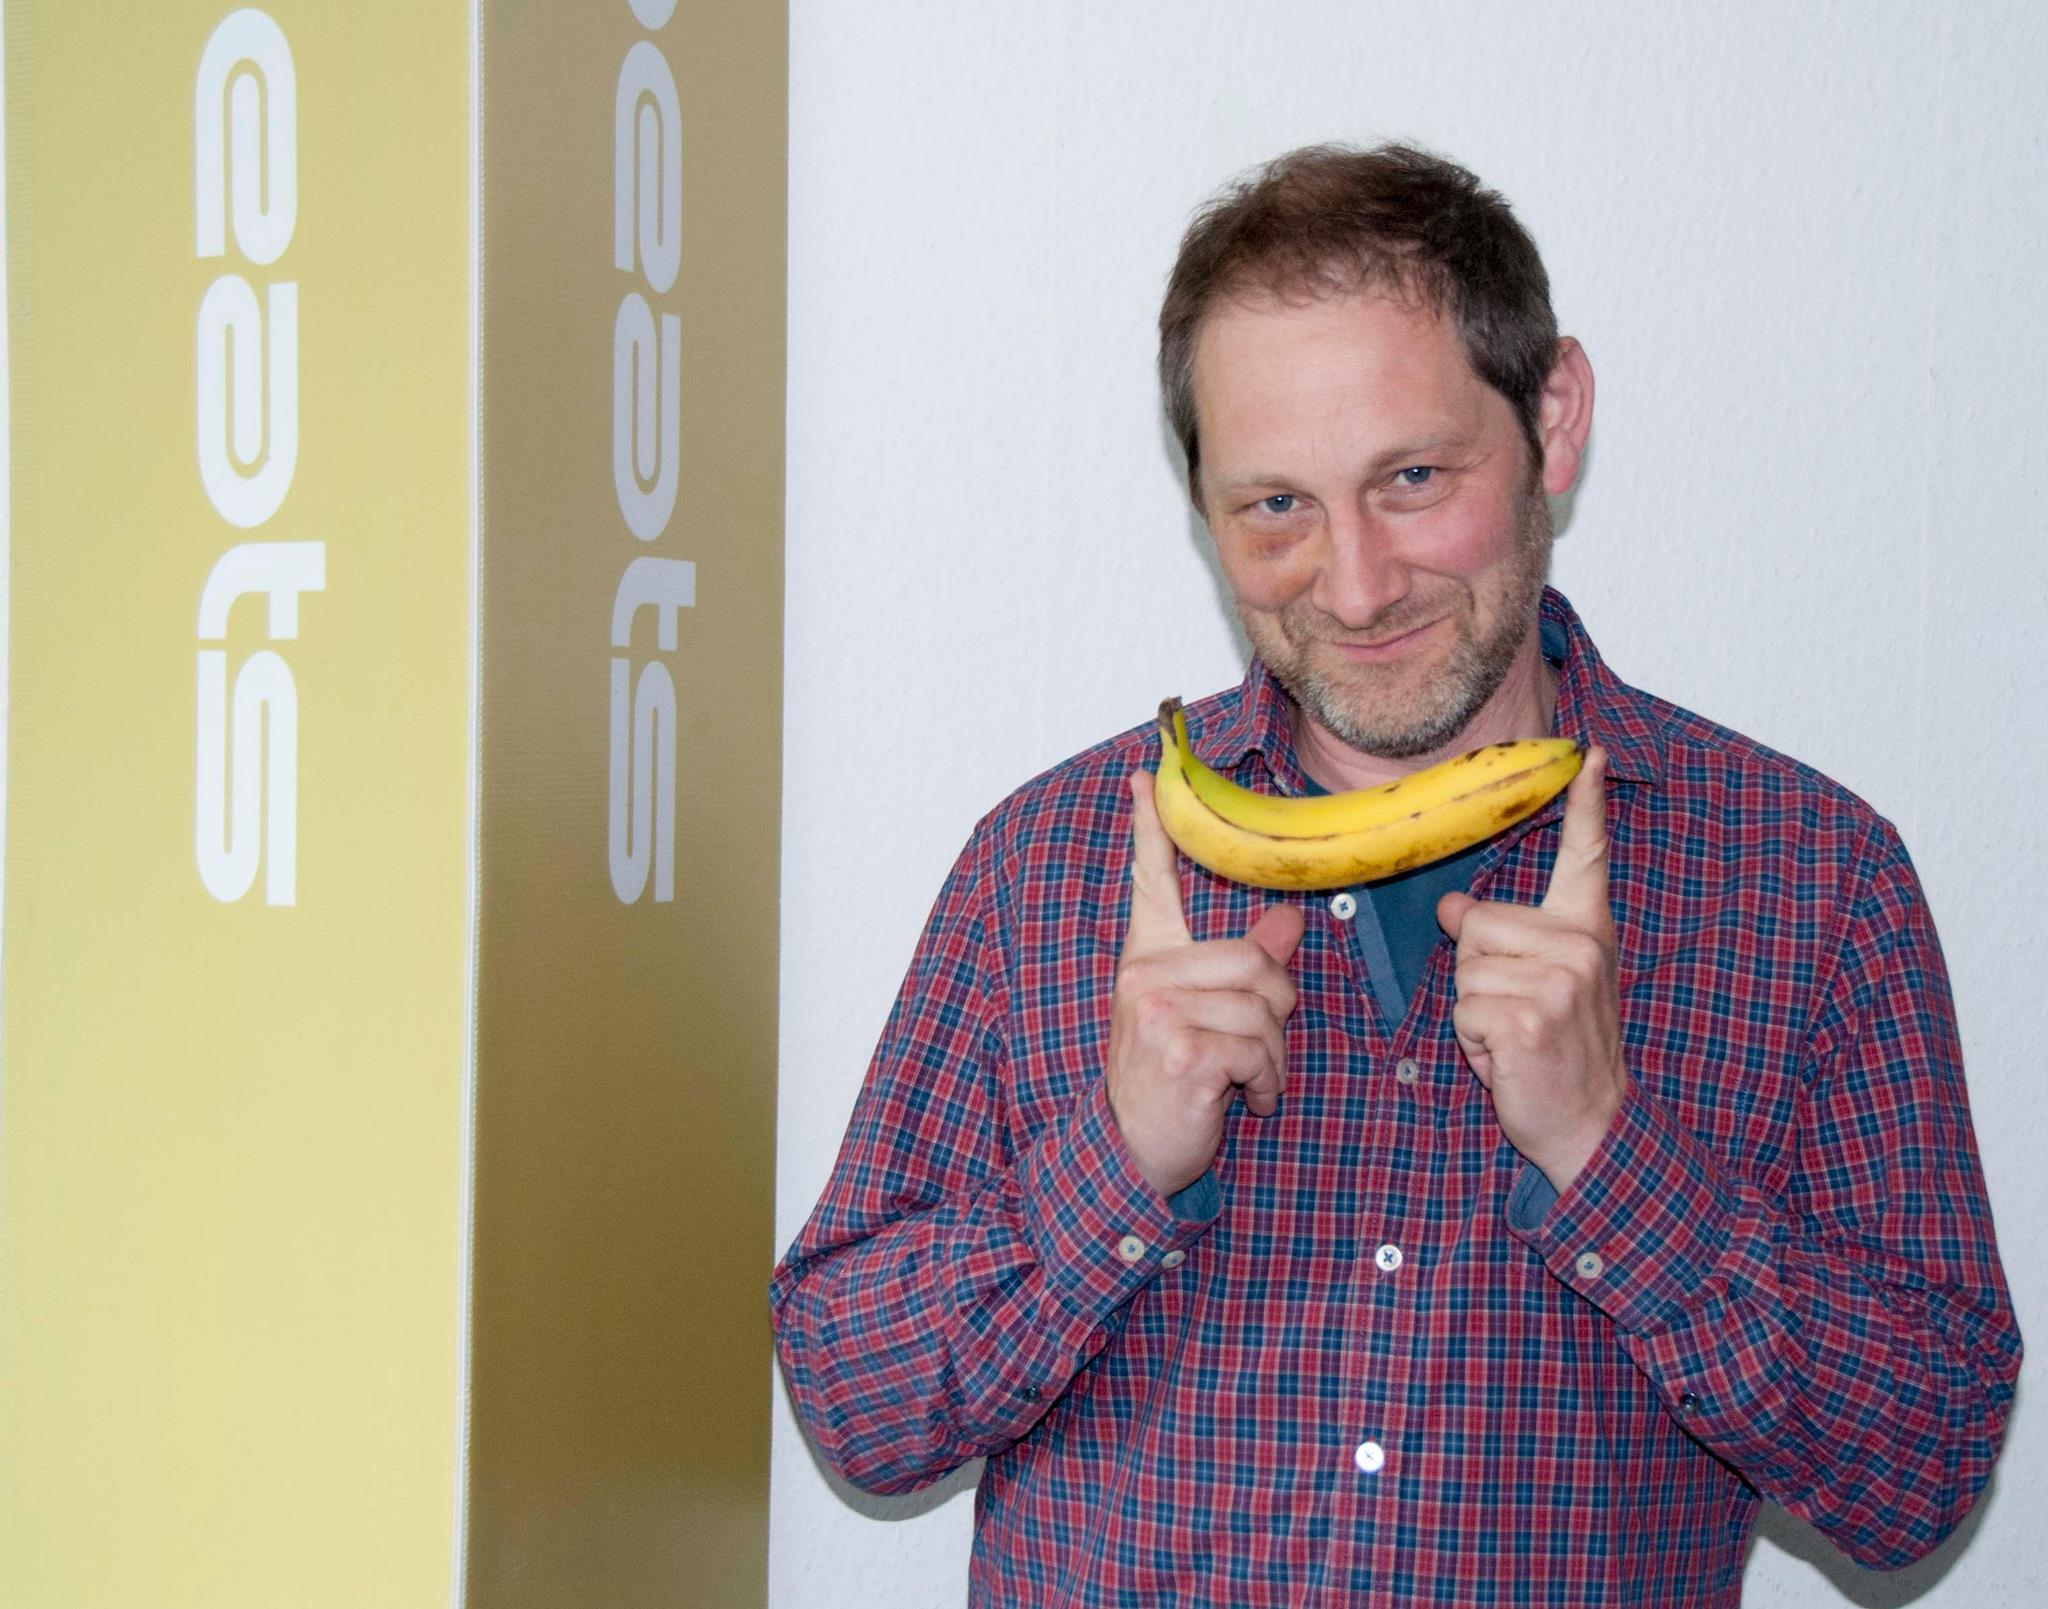 Banana-Smile Foto: Johanna Mack